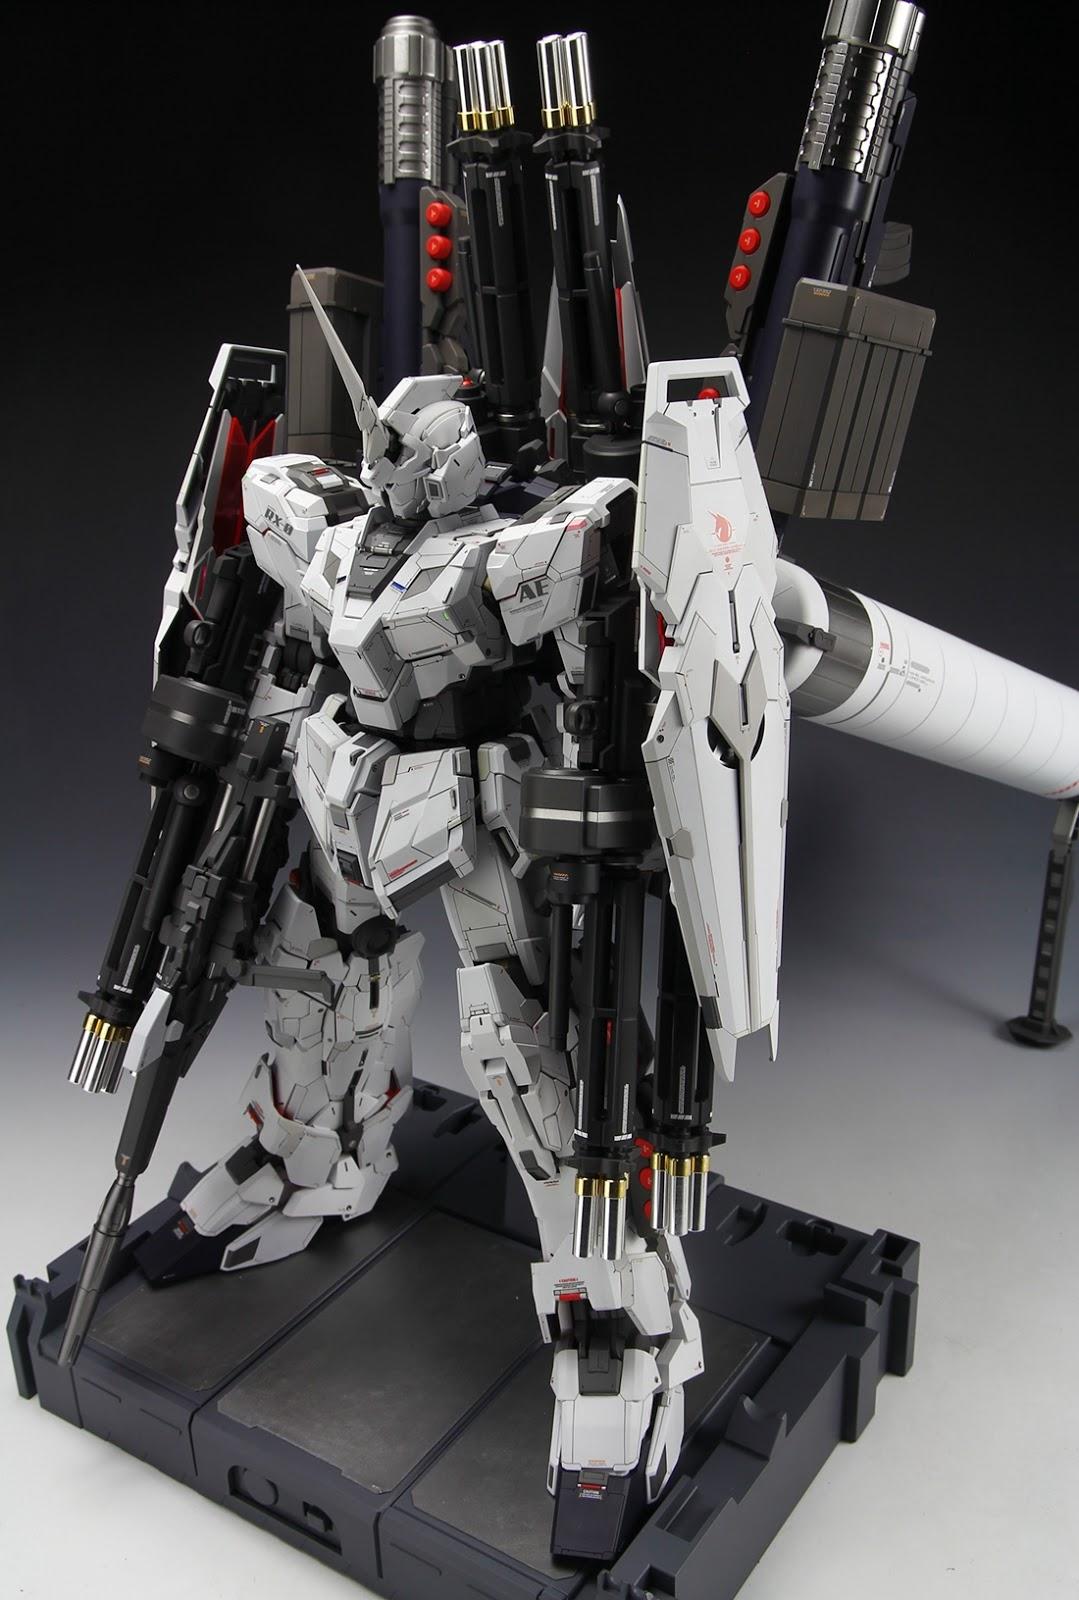 PG 1/60 Unicorn Gundam + Full Armor Part Set - Customized Build